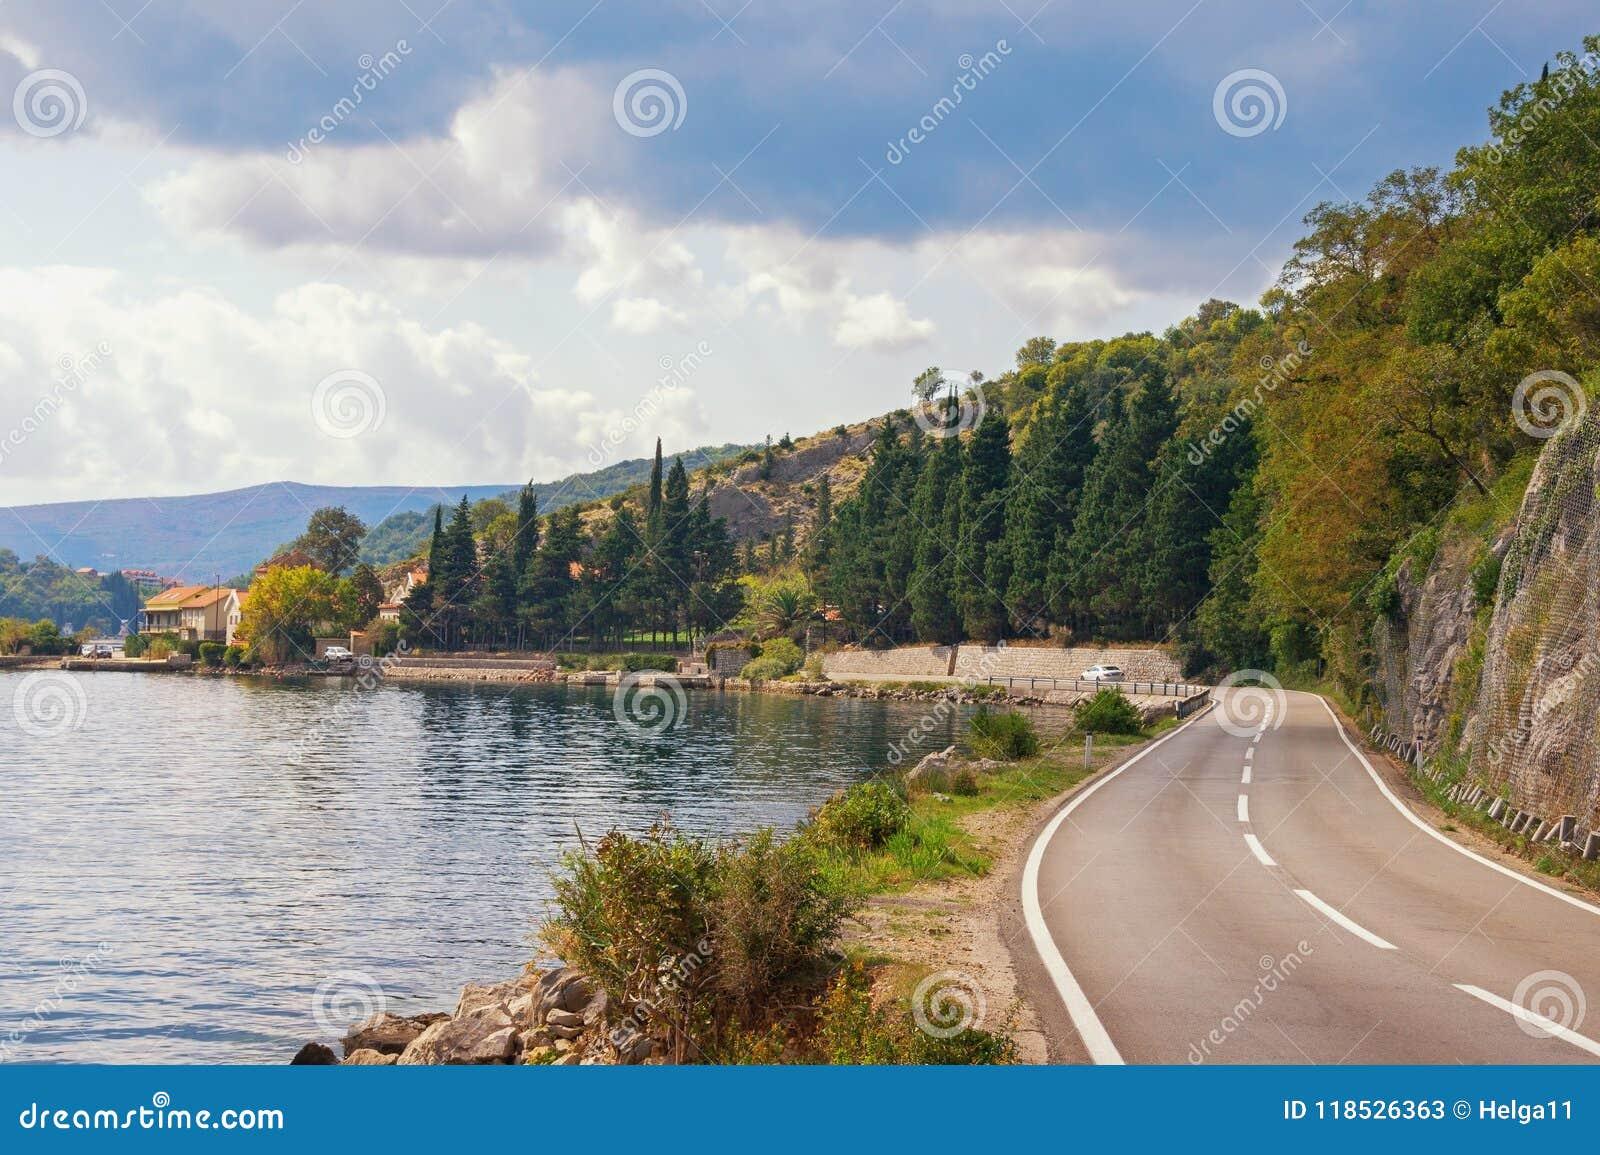 Autumn road along the sea. Montenegro, Bay of Kotor Adriatic Sea